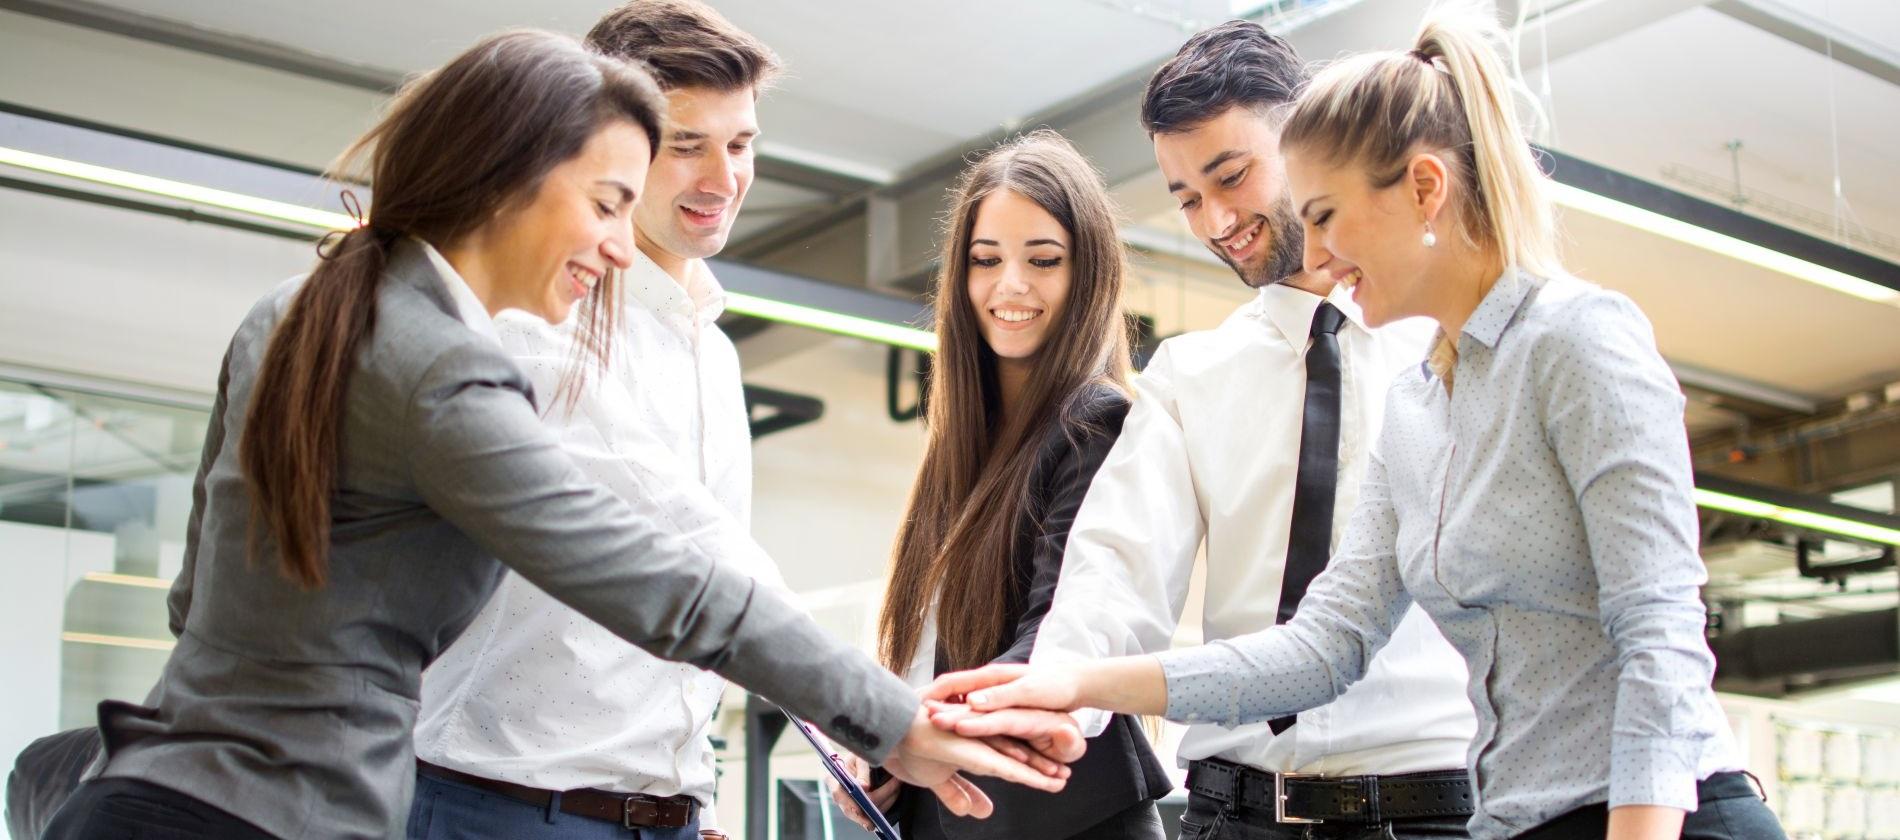 Motywowanie pracowników, Lean Enterprise Institute Polska